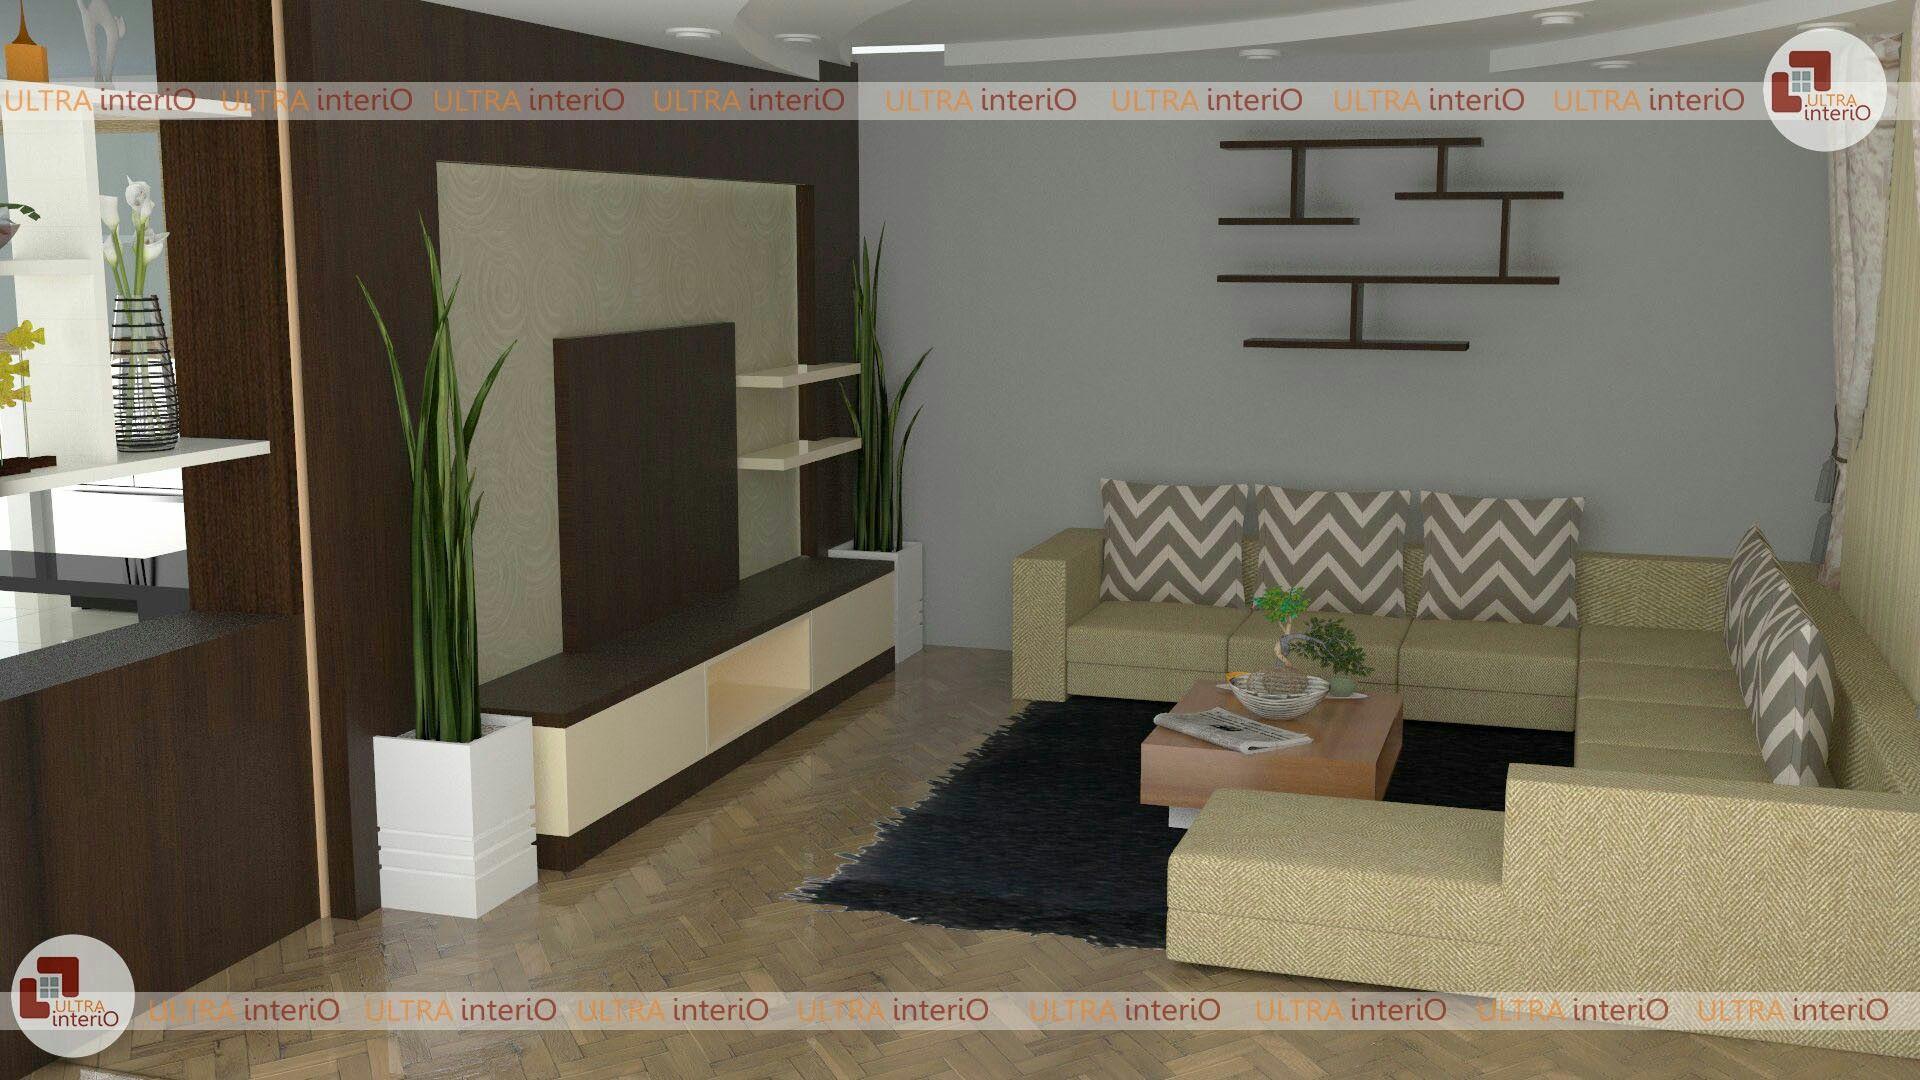 Living Nepal Livingideas Livingroom Bestinterior Interiorinnepal Best Interior Home Decor Furniture